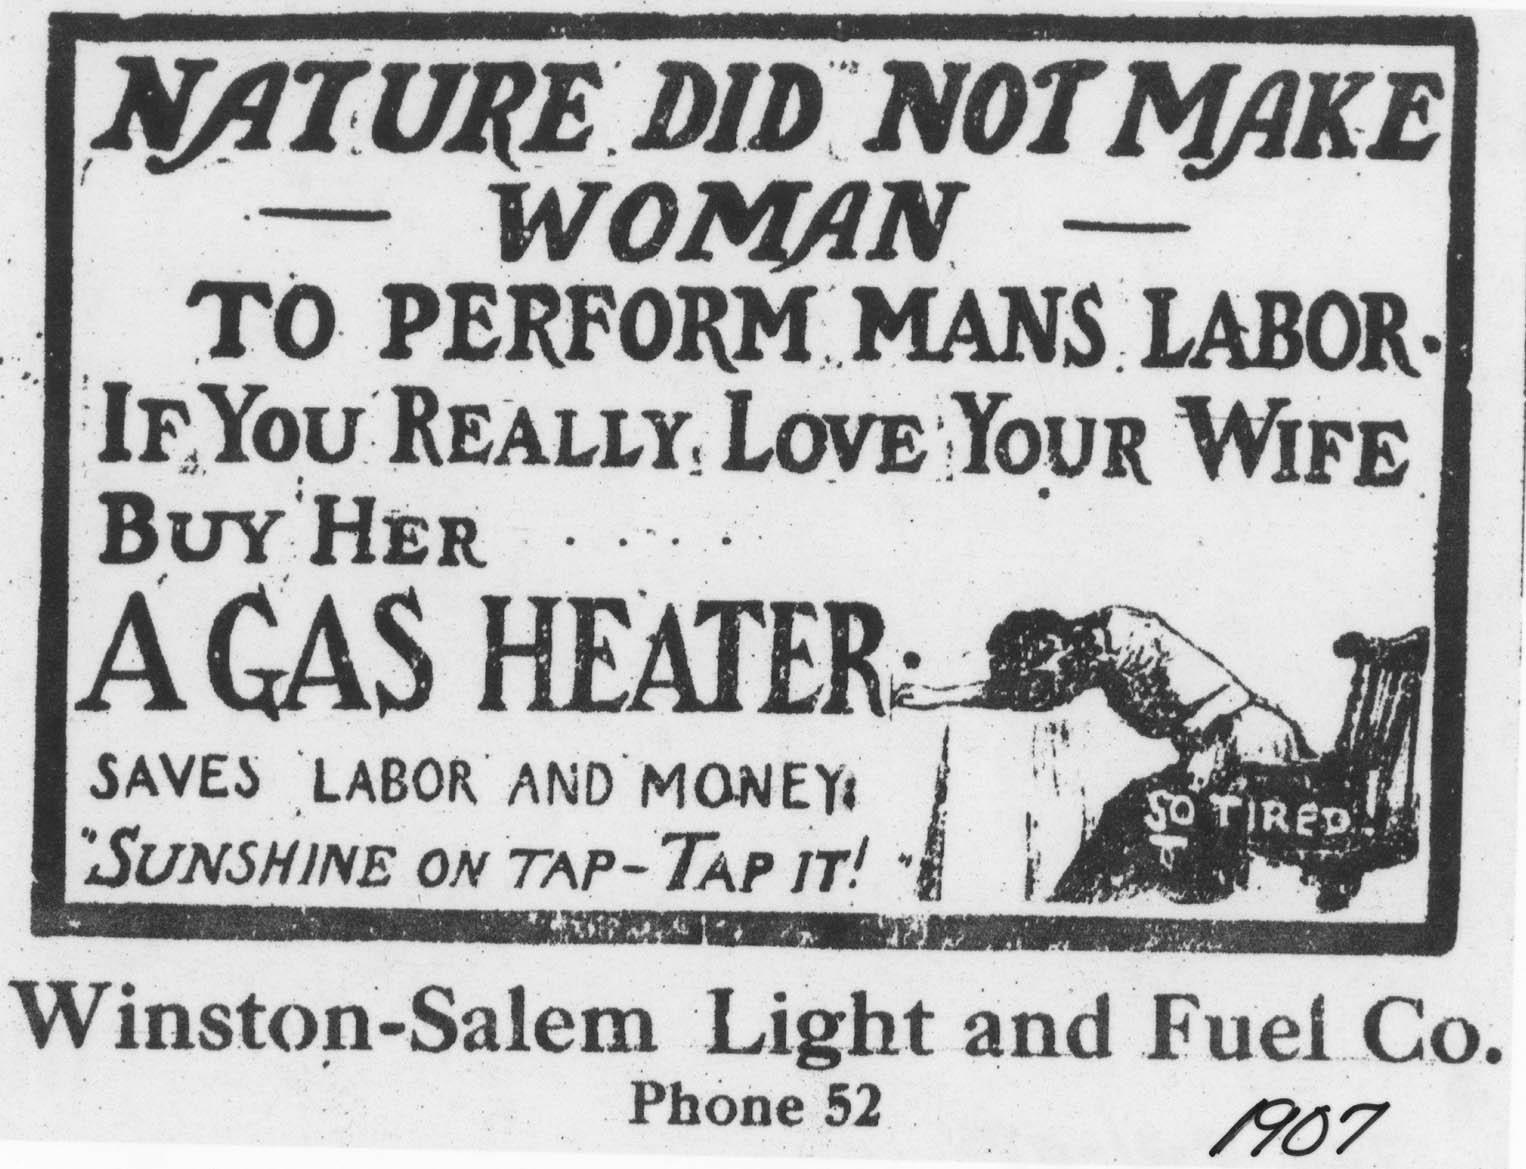 advertising for women in the early 1900s winstonsalem